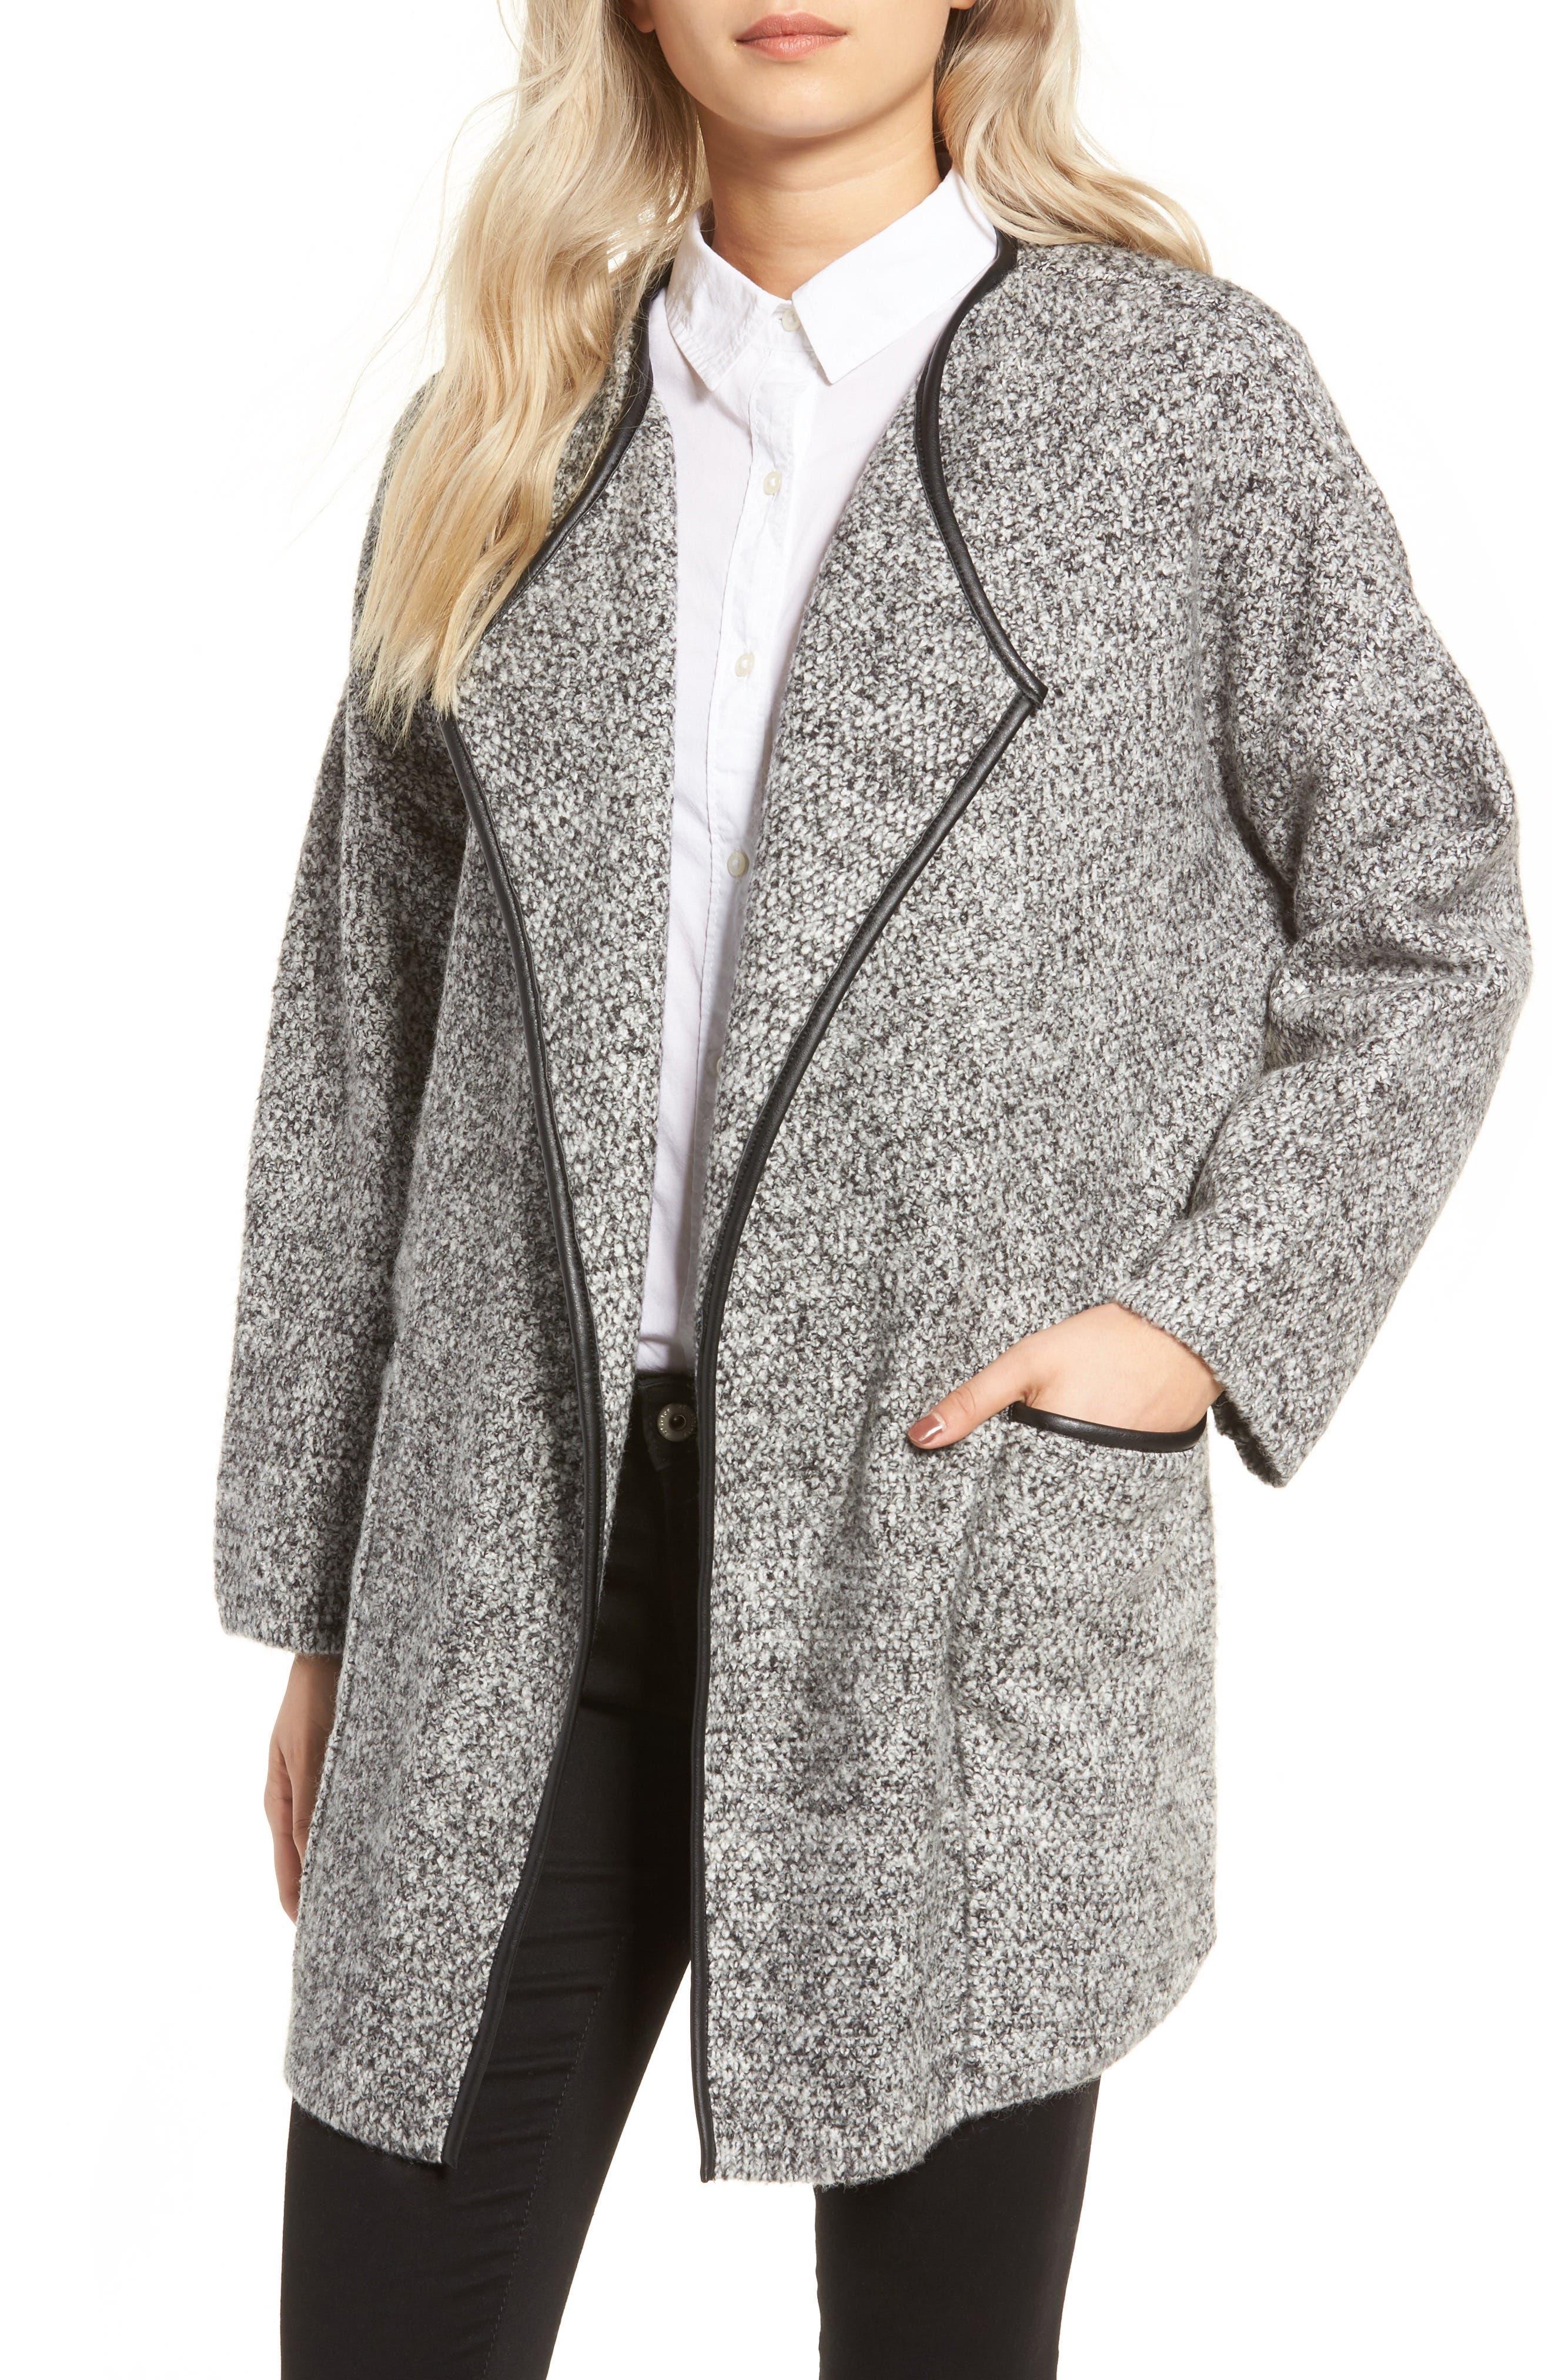 ASTR THE LABEL,                             ASTR Drape Front Sweater Jacket,                             Main thumbnail 1, color,                             001